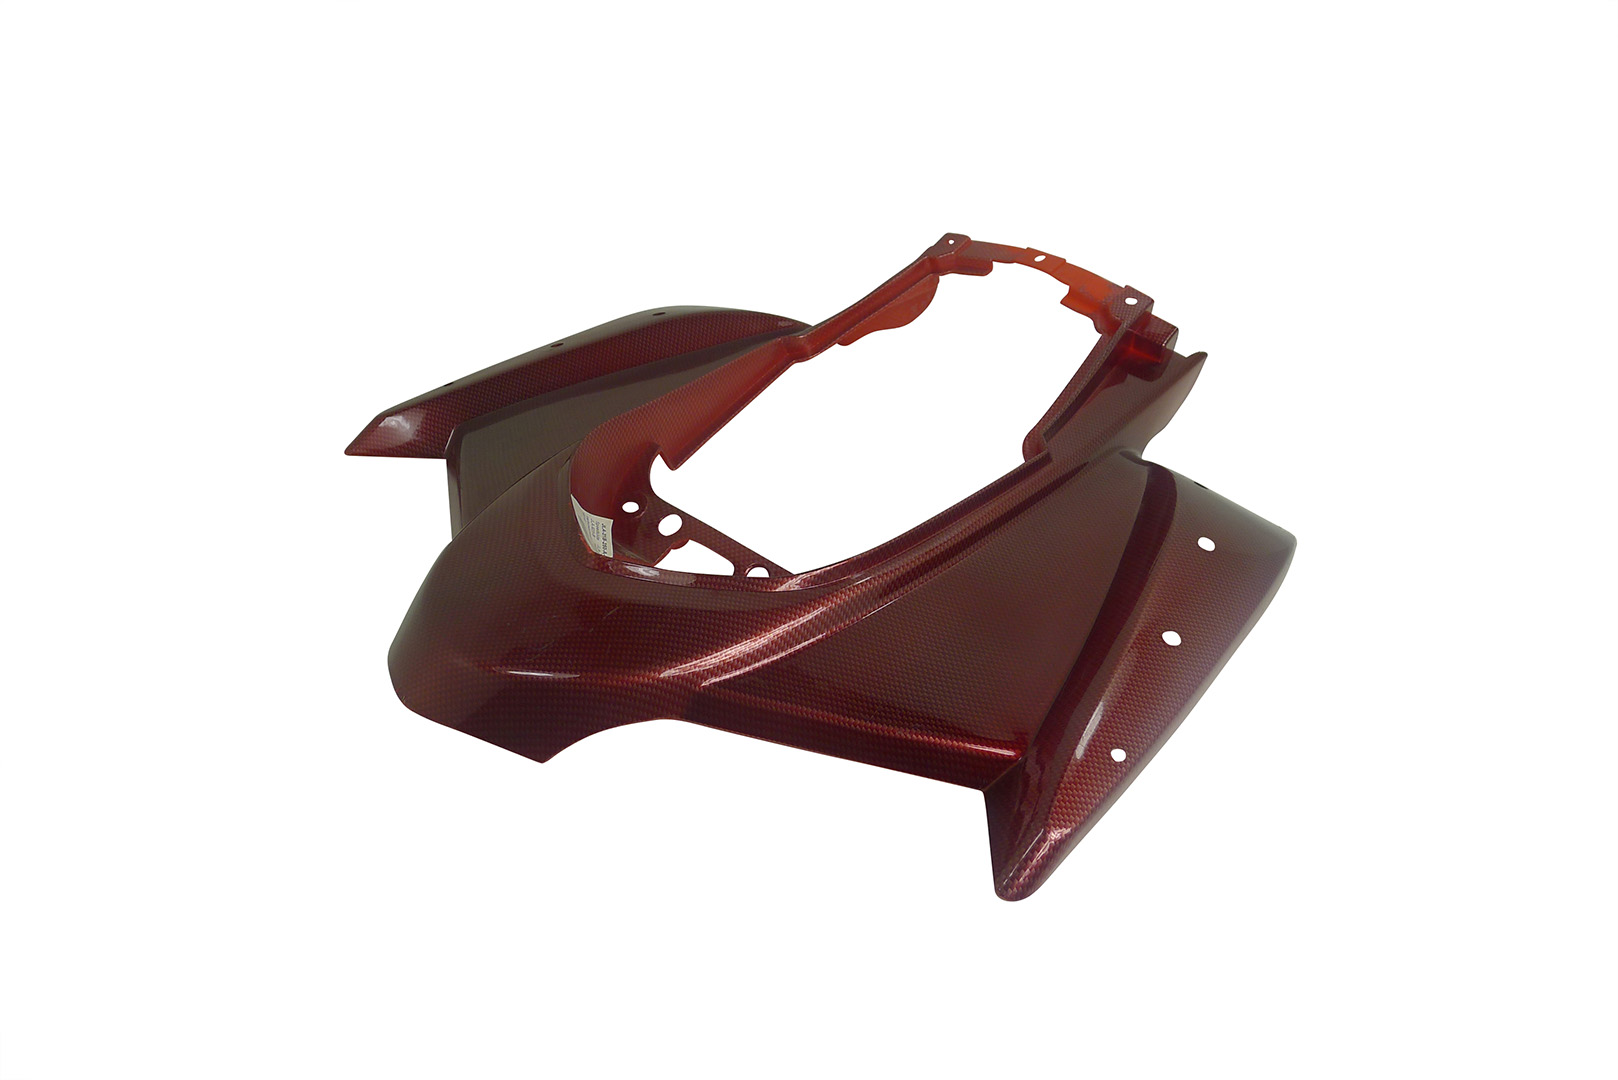 jinling speedslide jla 21b speedtrike jla 923 b. Black Bedroom Furniture Sets. Home Design Ideas